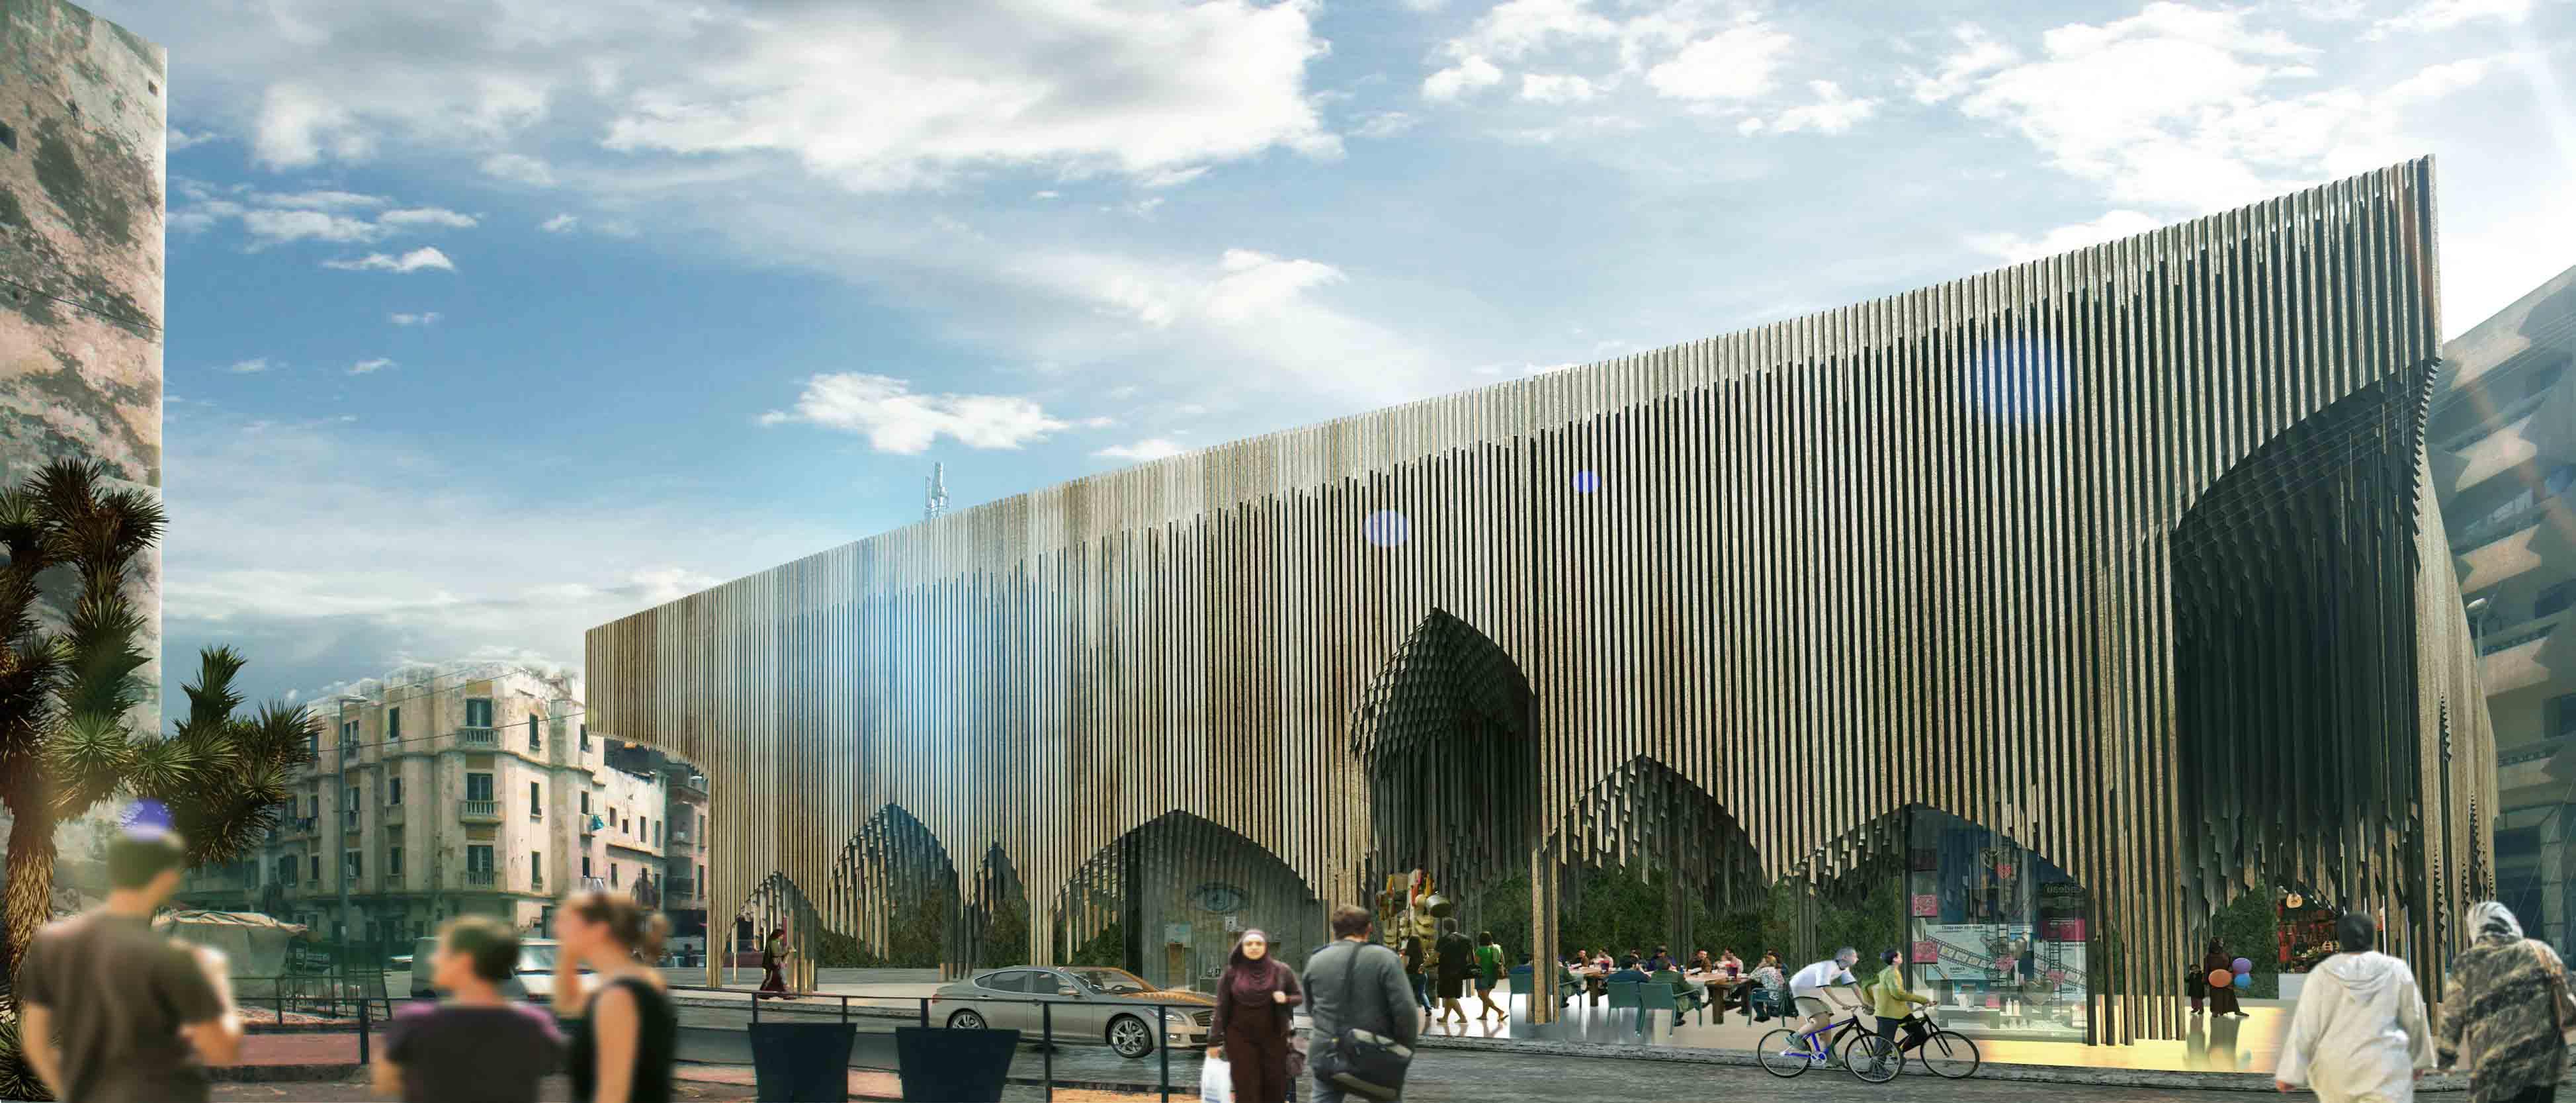 2º Lugar: Praça do Mercado Sustentável / PMG Architects, © Cortesia de PMG Architects